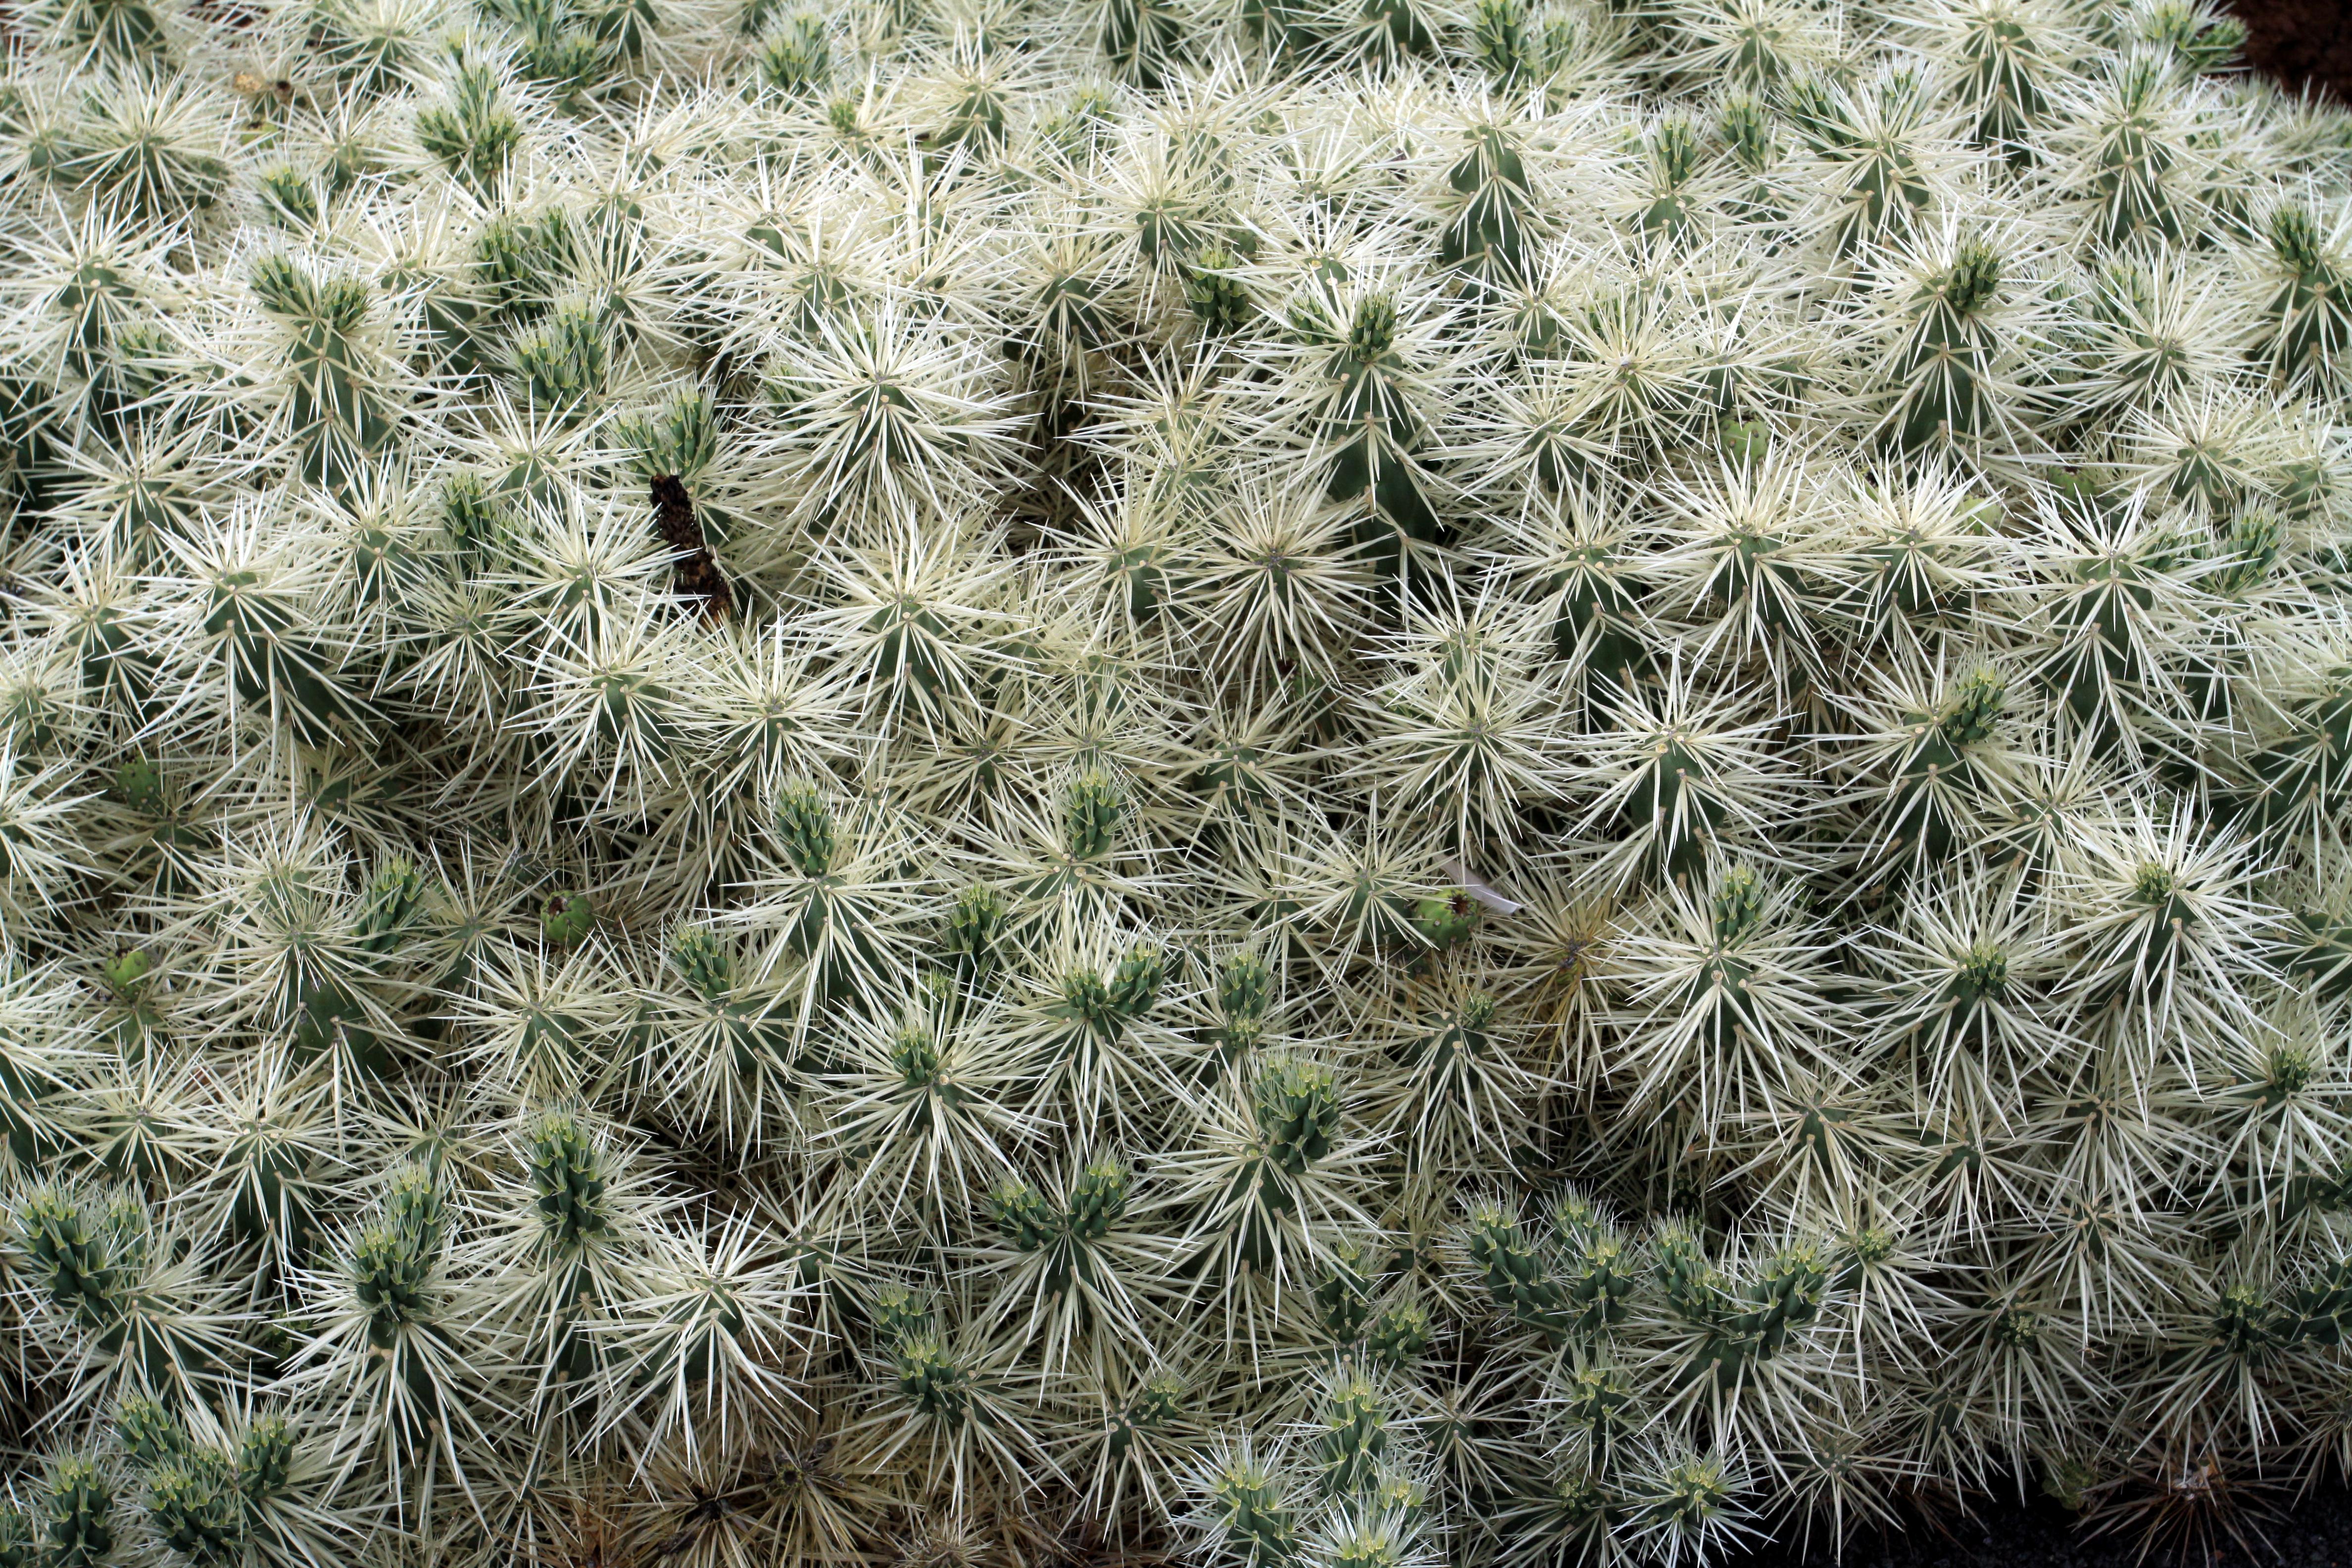 File cylindropuntia tunicata in jardin de cactus on for Jardin de cactus lanzarote